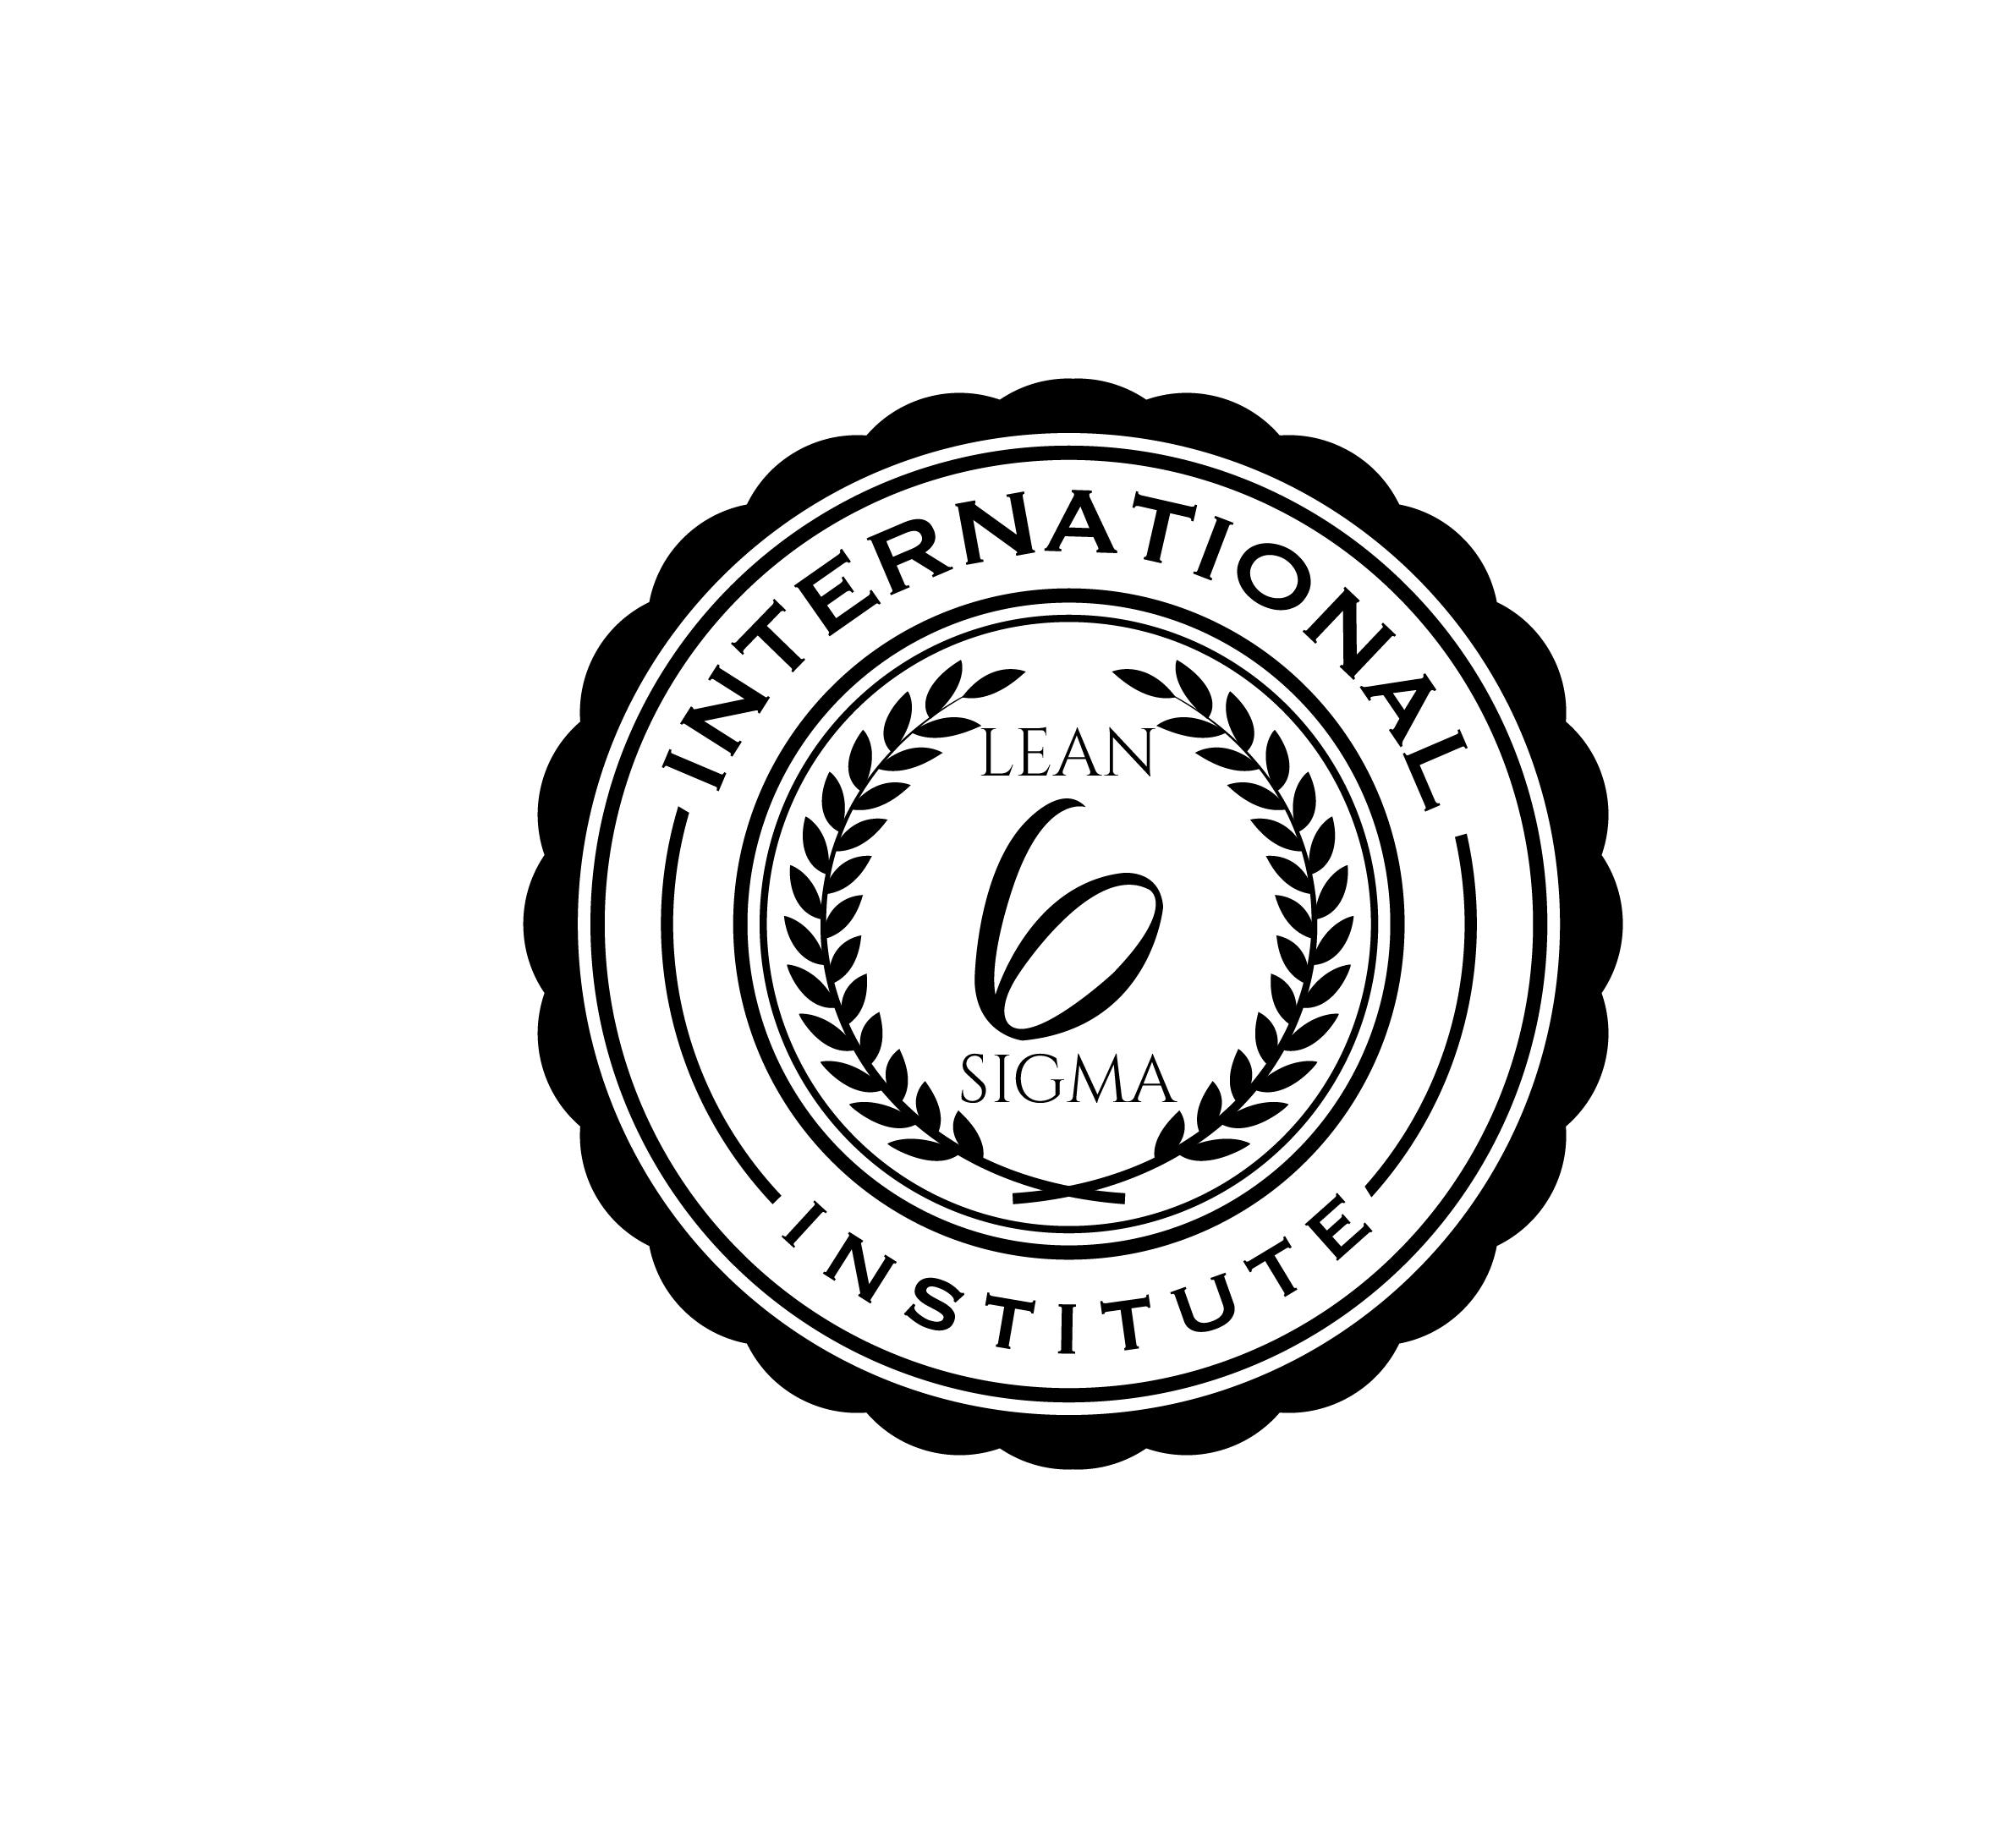 International Lean Six Sigma Conference CAMBRIDGE 2021